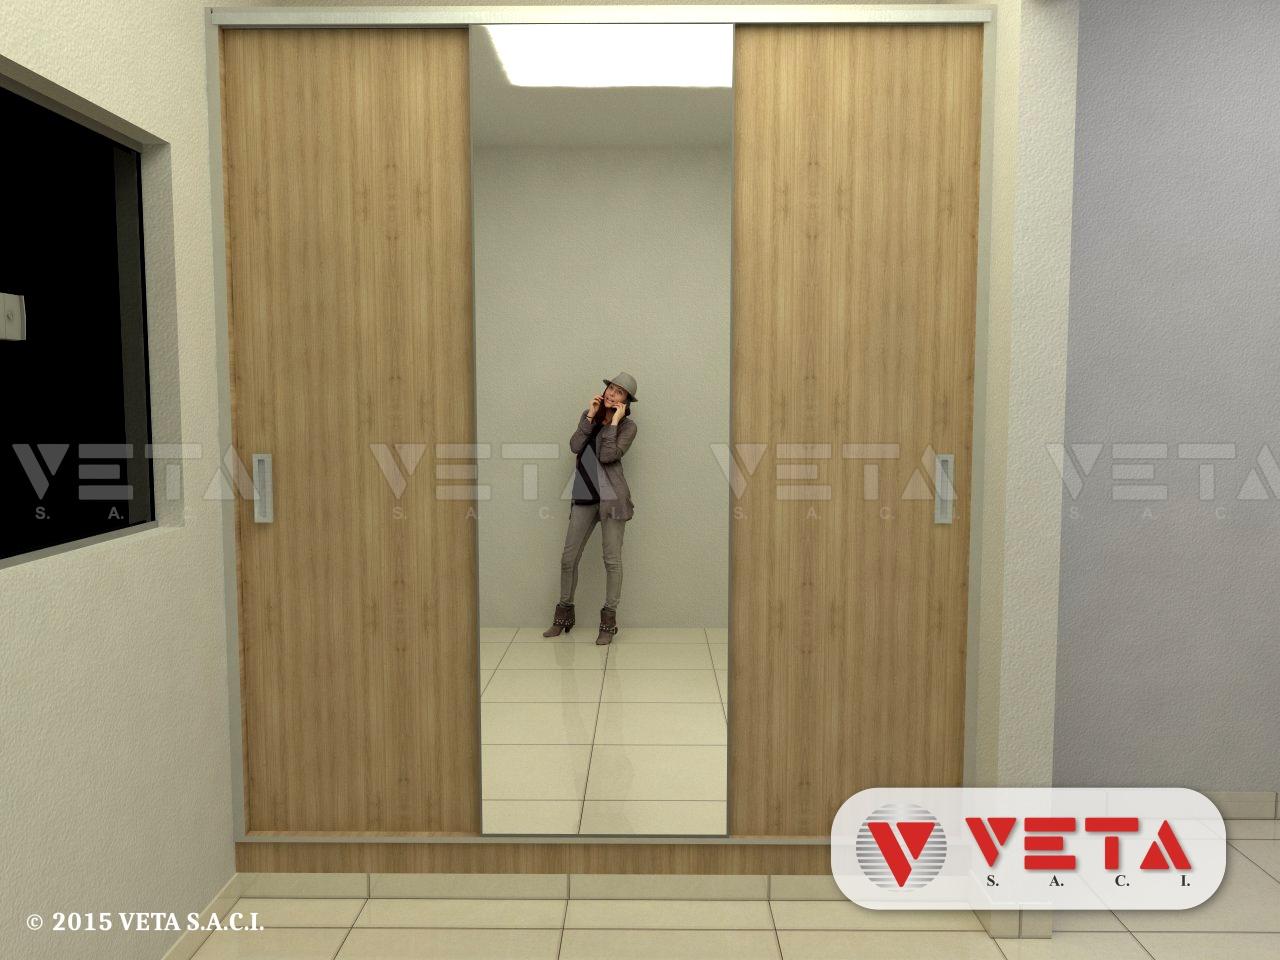 Vestidores para dormitorios - VETA S.A.C.I.